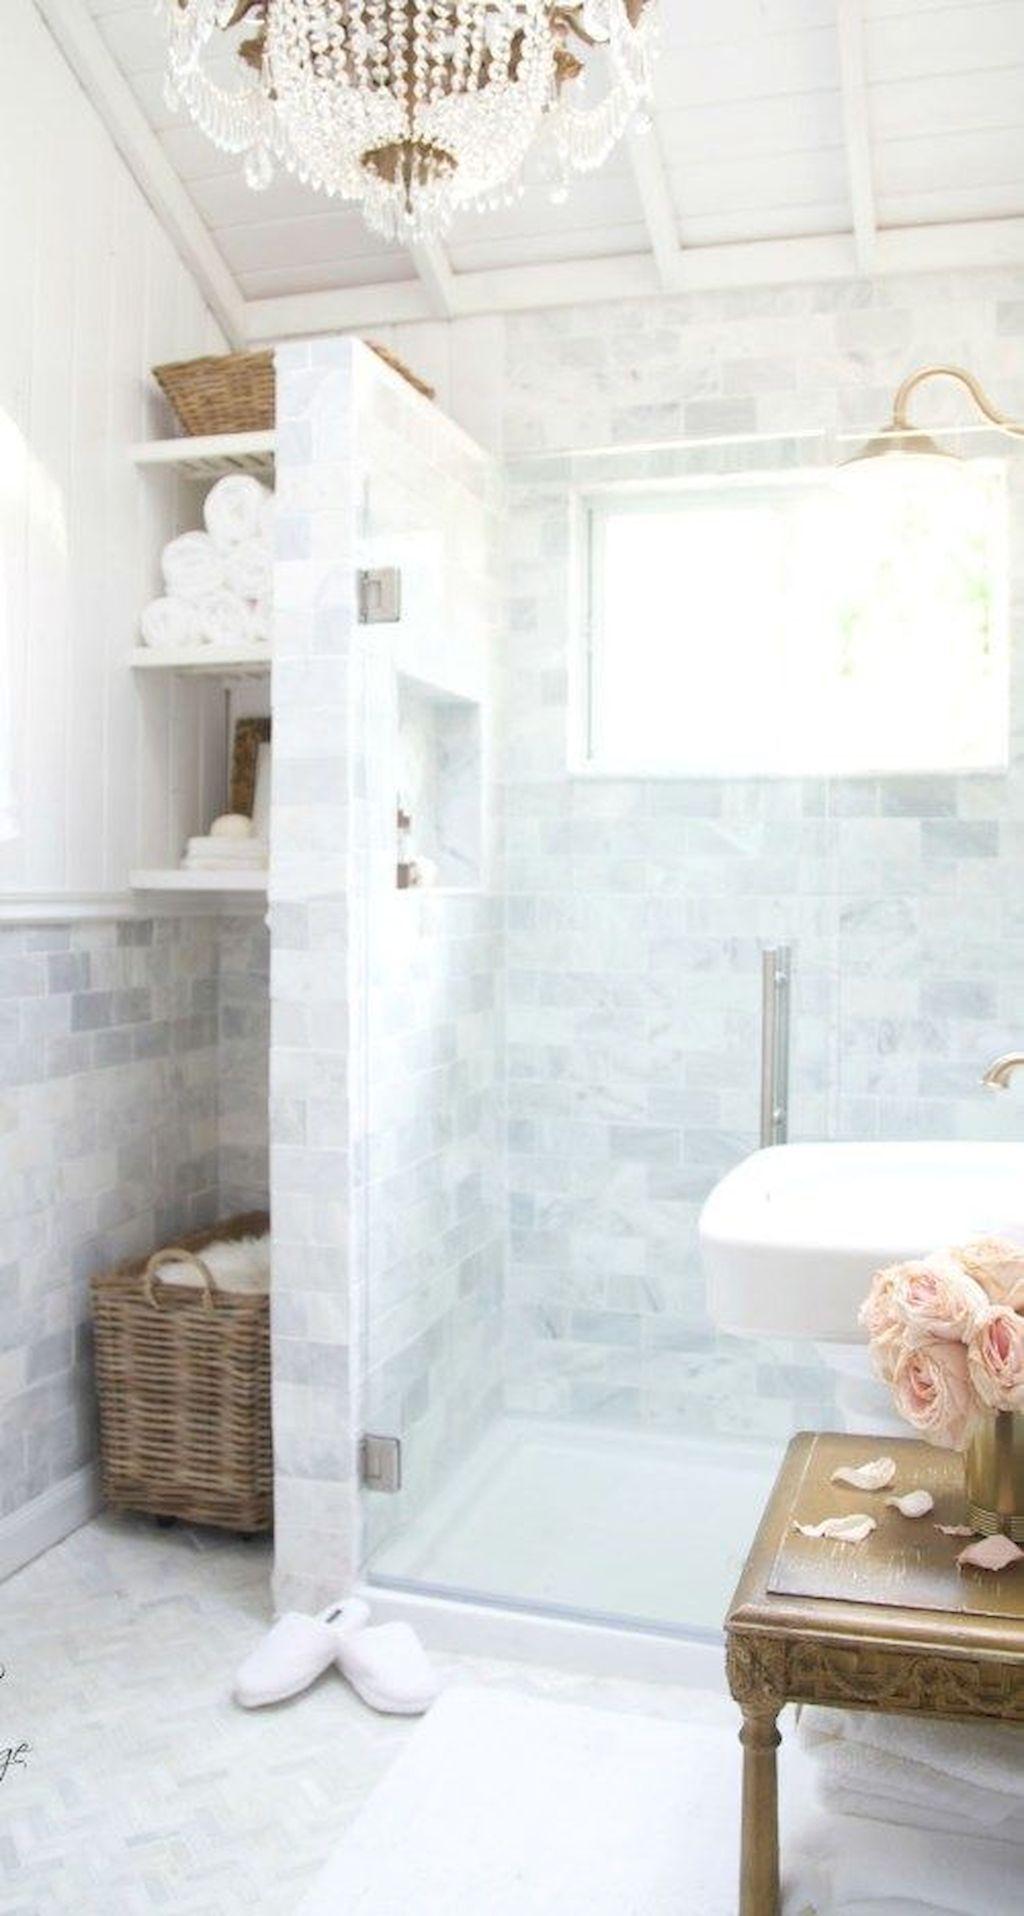 65 Inspiring French Country Bathroom Design Ideas Homixover Com Country Bathroom Designs Modern Country Bathrooms French Cottage Bathroom